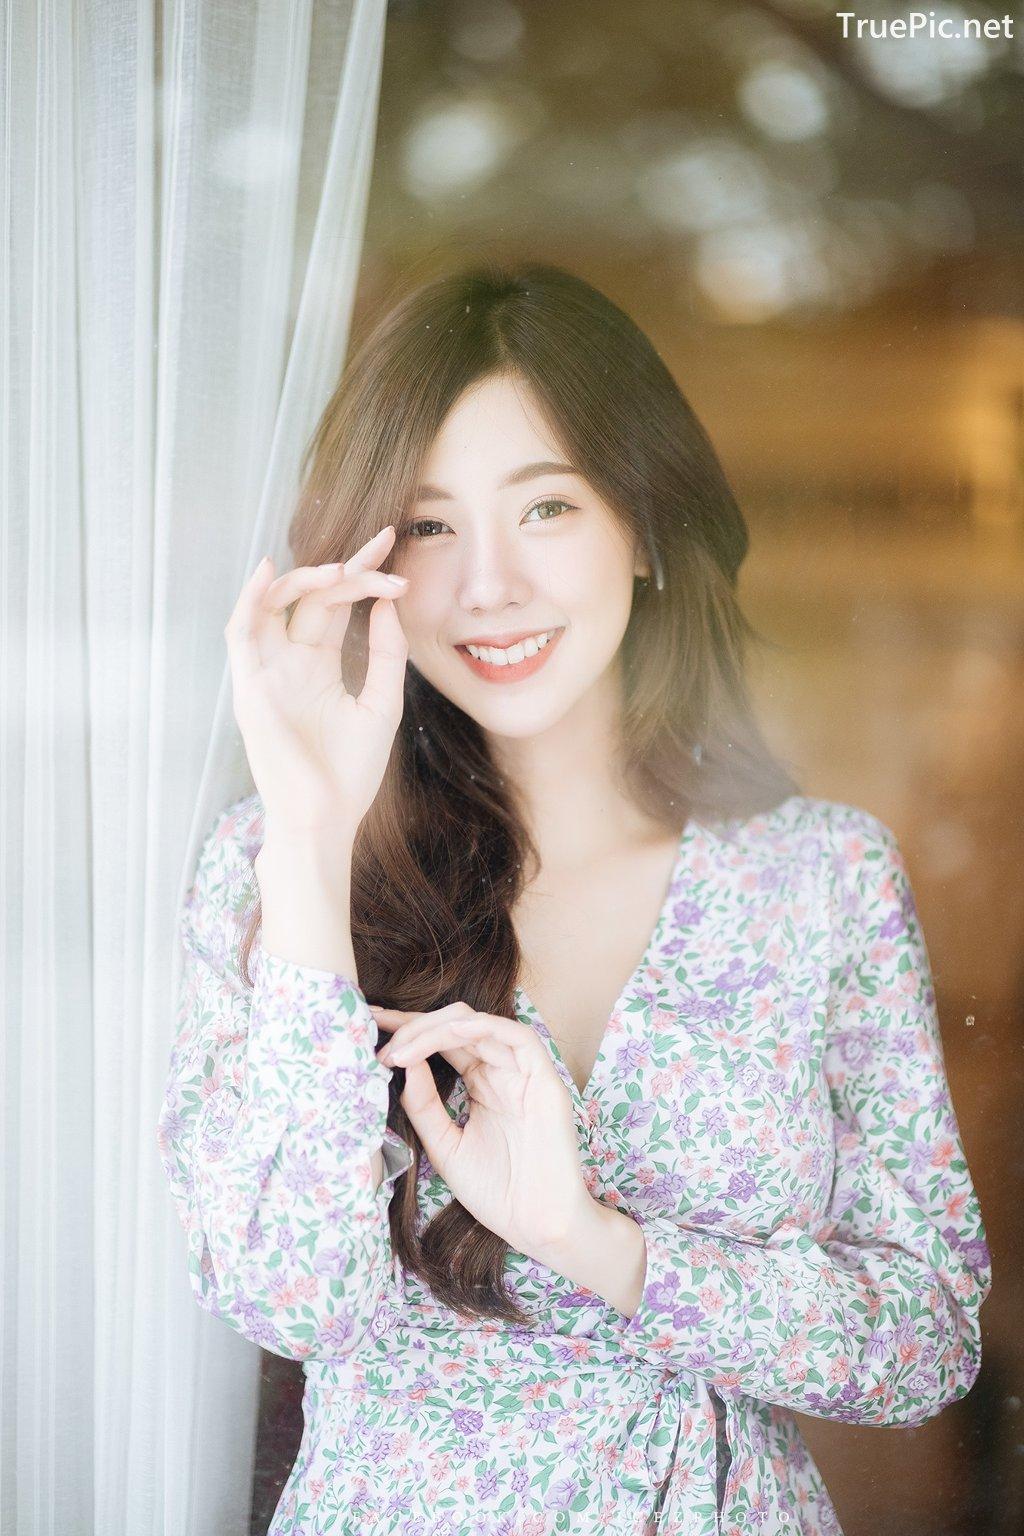 Image-Thailand-Hot-Girl-Nilawan-Iamchuasawad-Pure-Beauty-Early-Morning-TruePic.net- Picture-6